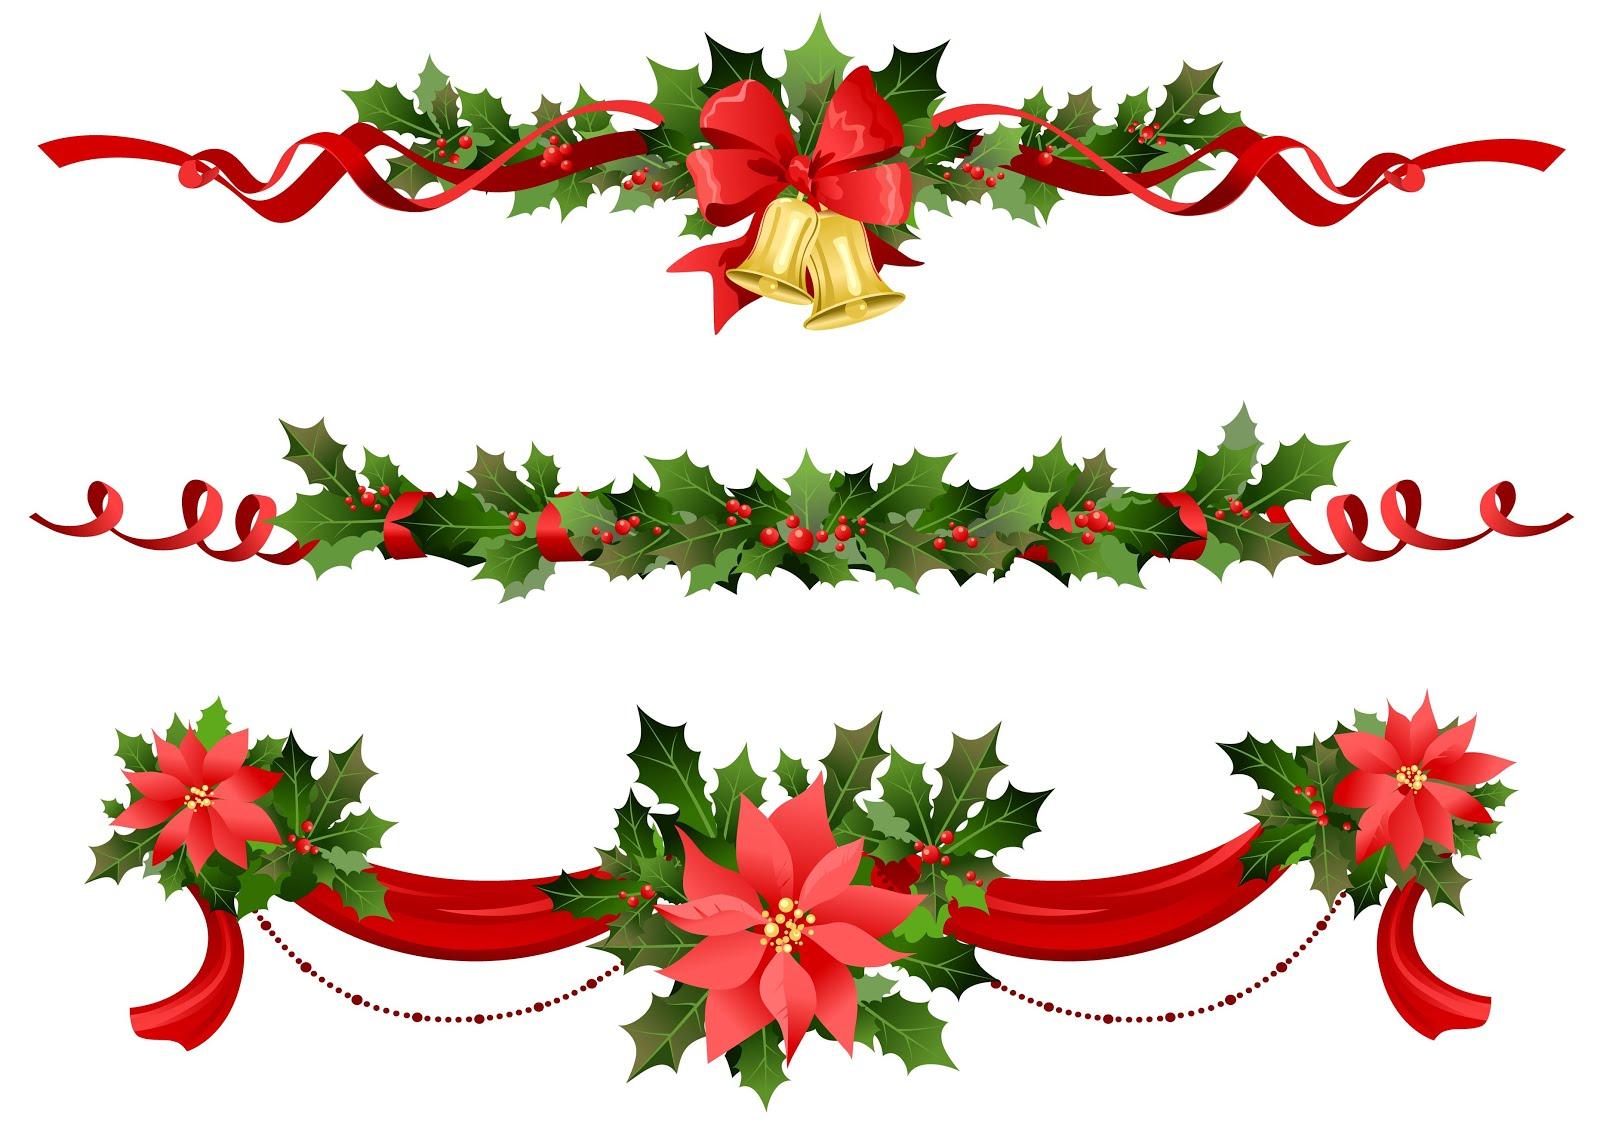 Imagen de cintas para adornos navide os frases de - Cinta arbol navidad ...